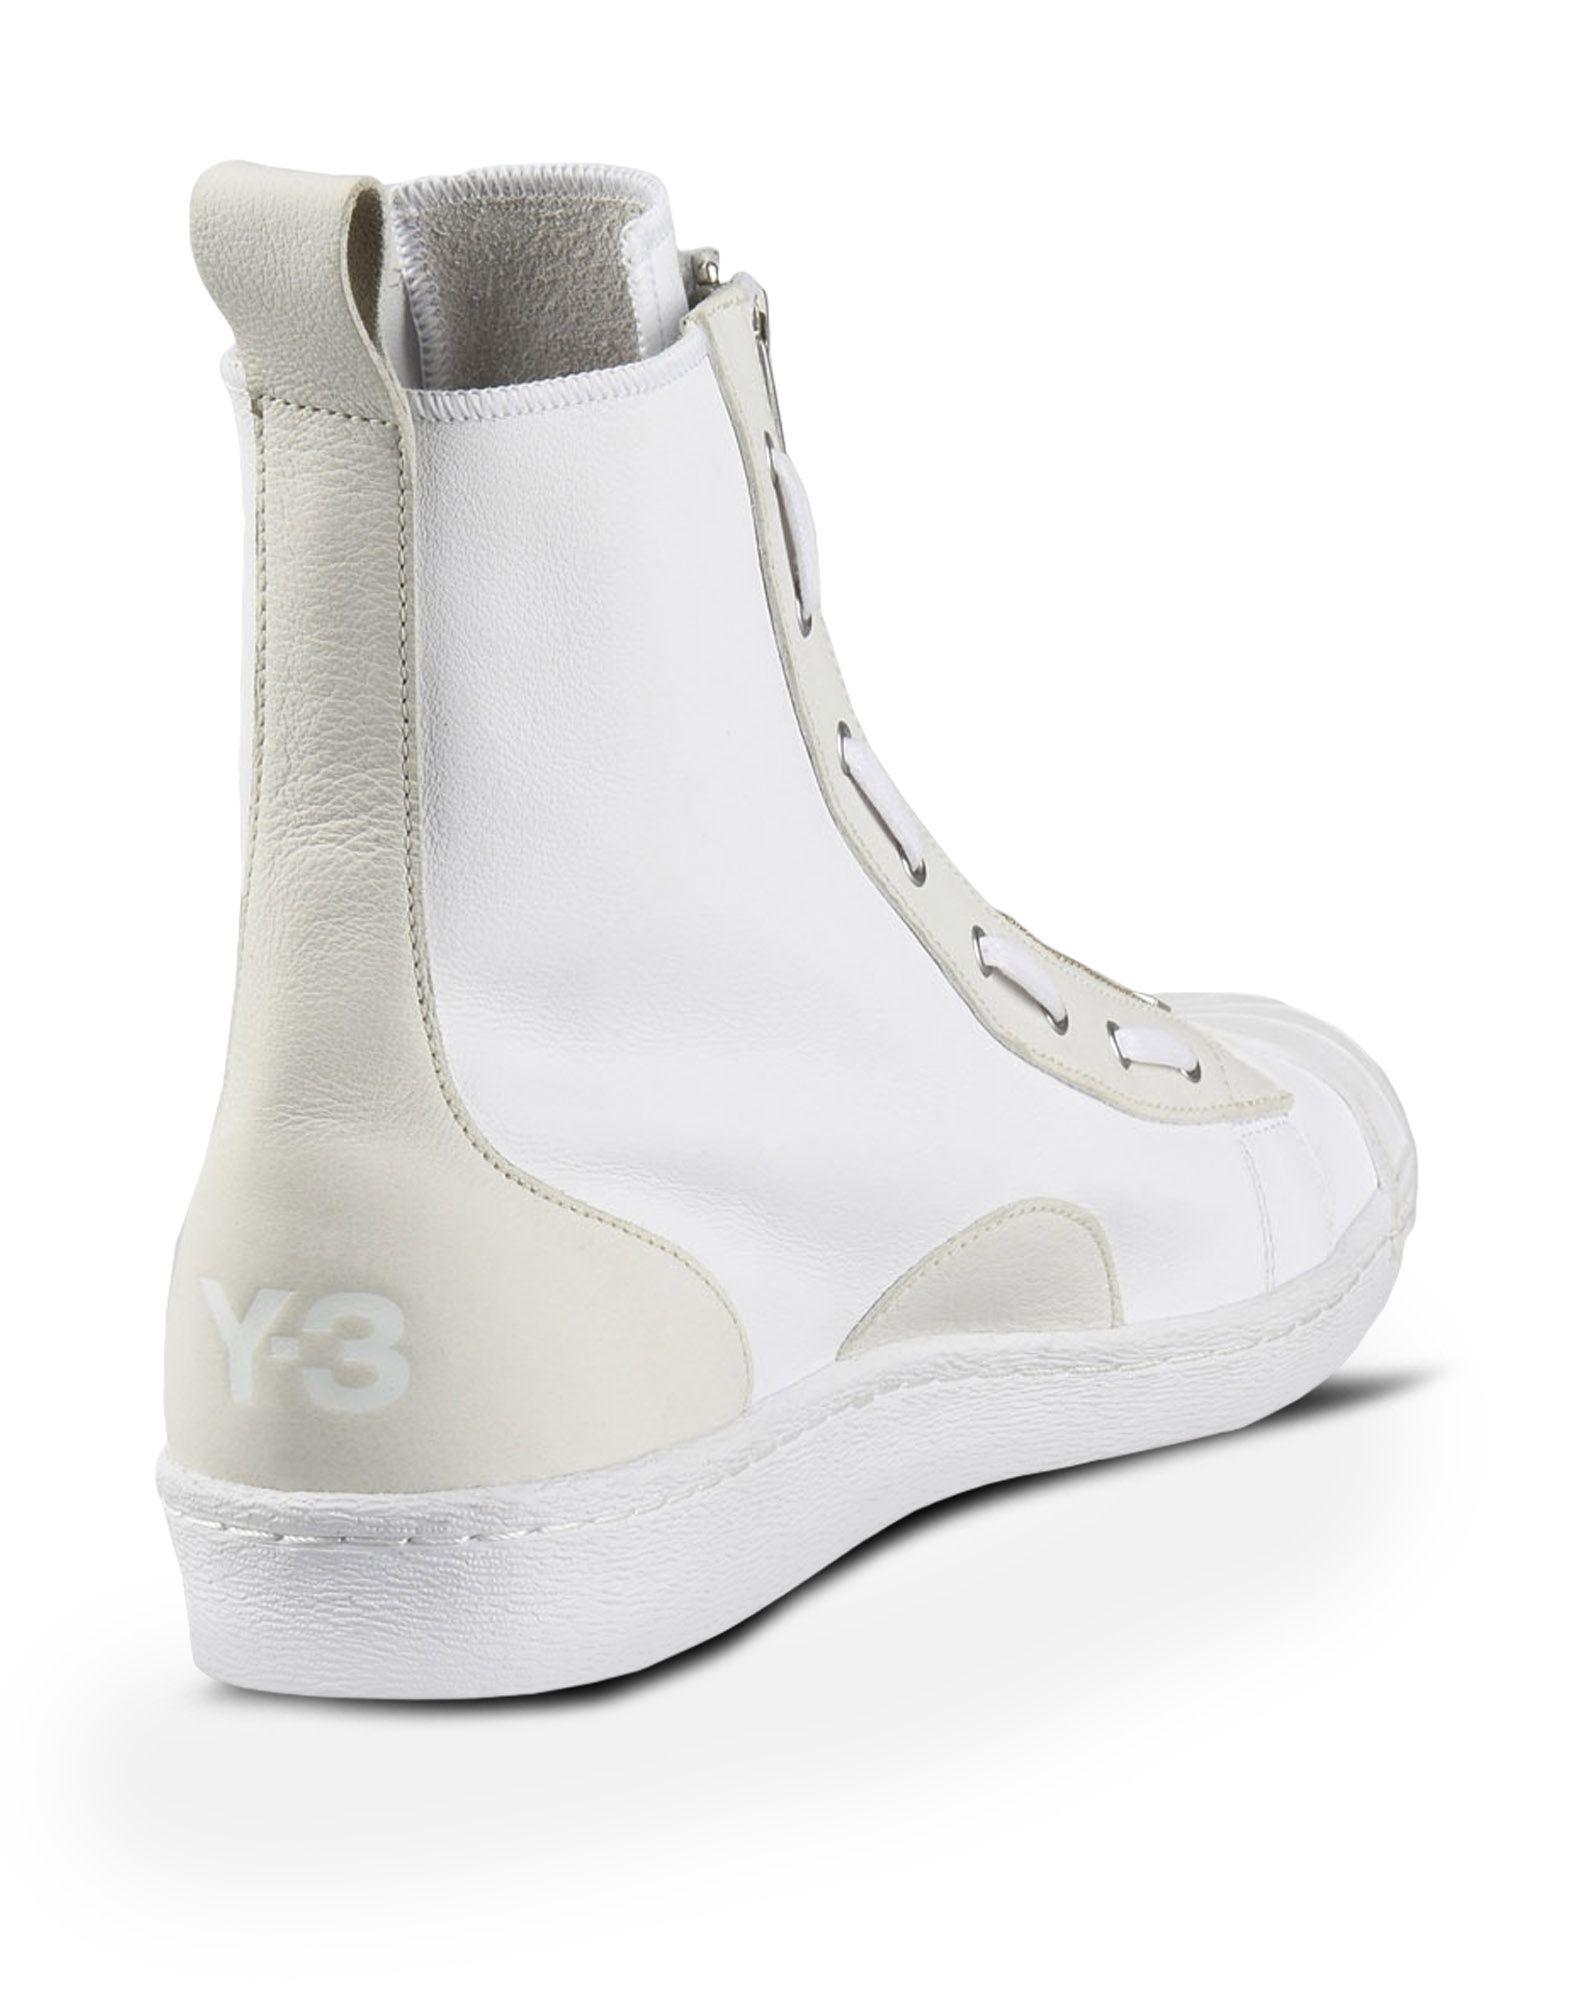 0ab569ae173b6 ... Y-3 Y-3 PRO ZIP High-top sneakers E d ...